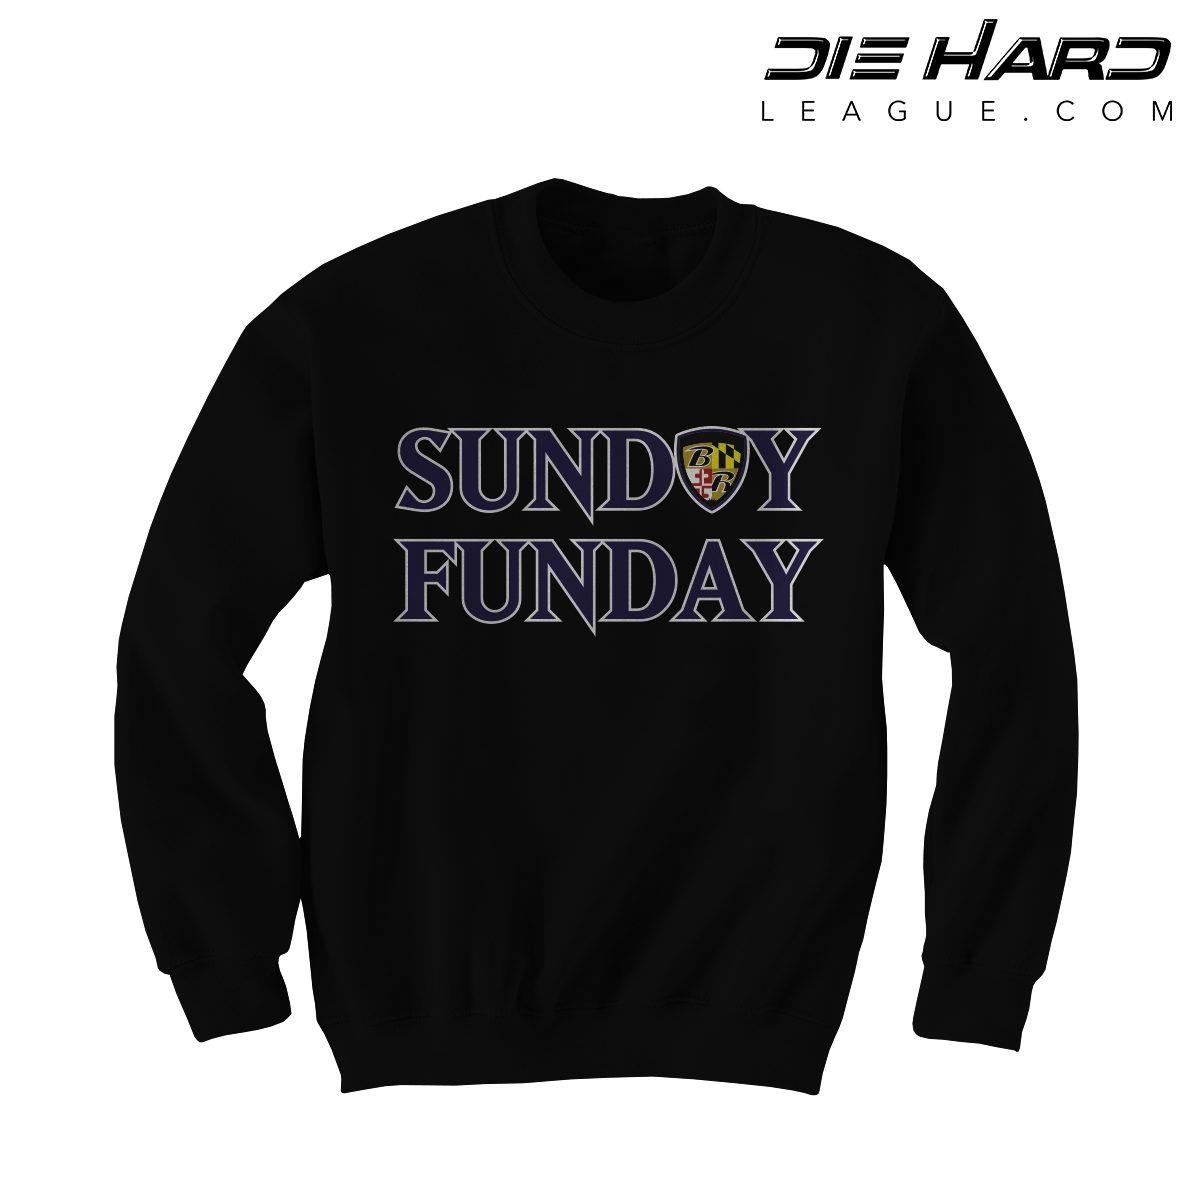 770df1ebe9834 Shop. Home/Baltimore Ravens/Ravens Shirts/Baltimore Ravens Sweatshirt – Sunday  Funday Black Crewneck